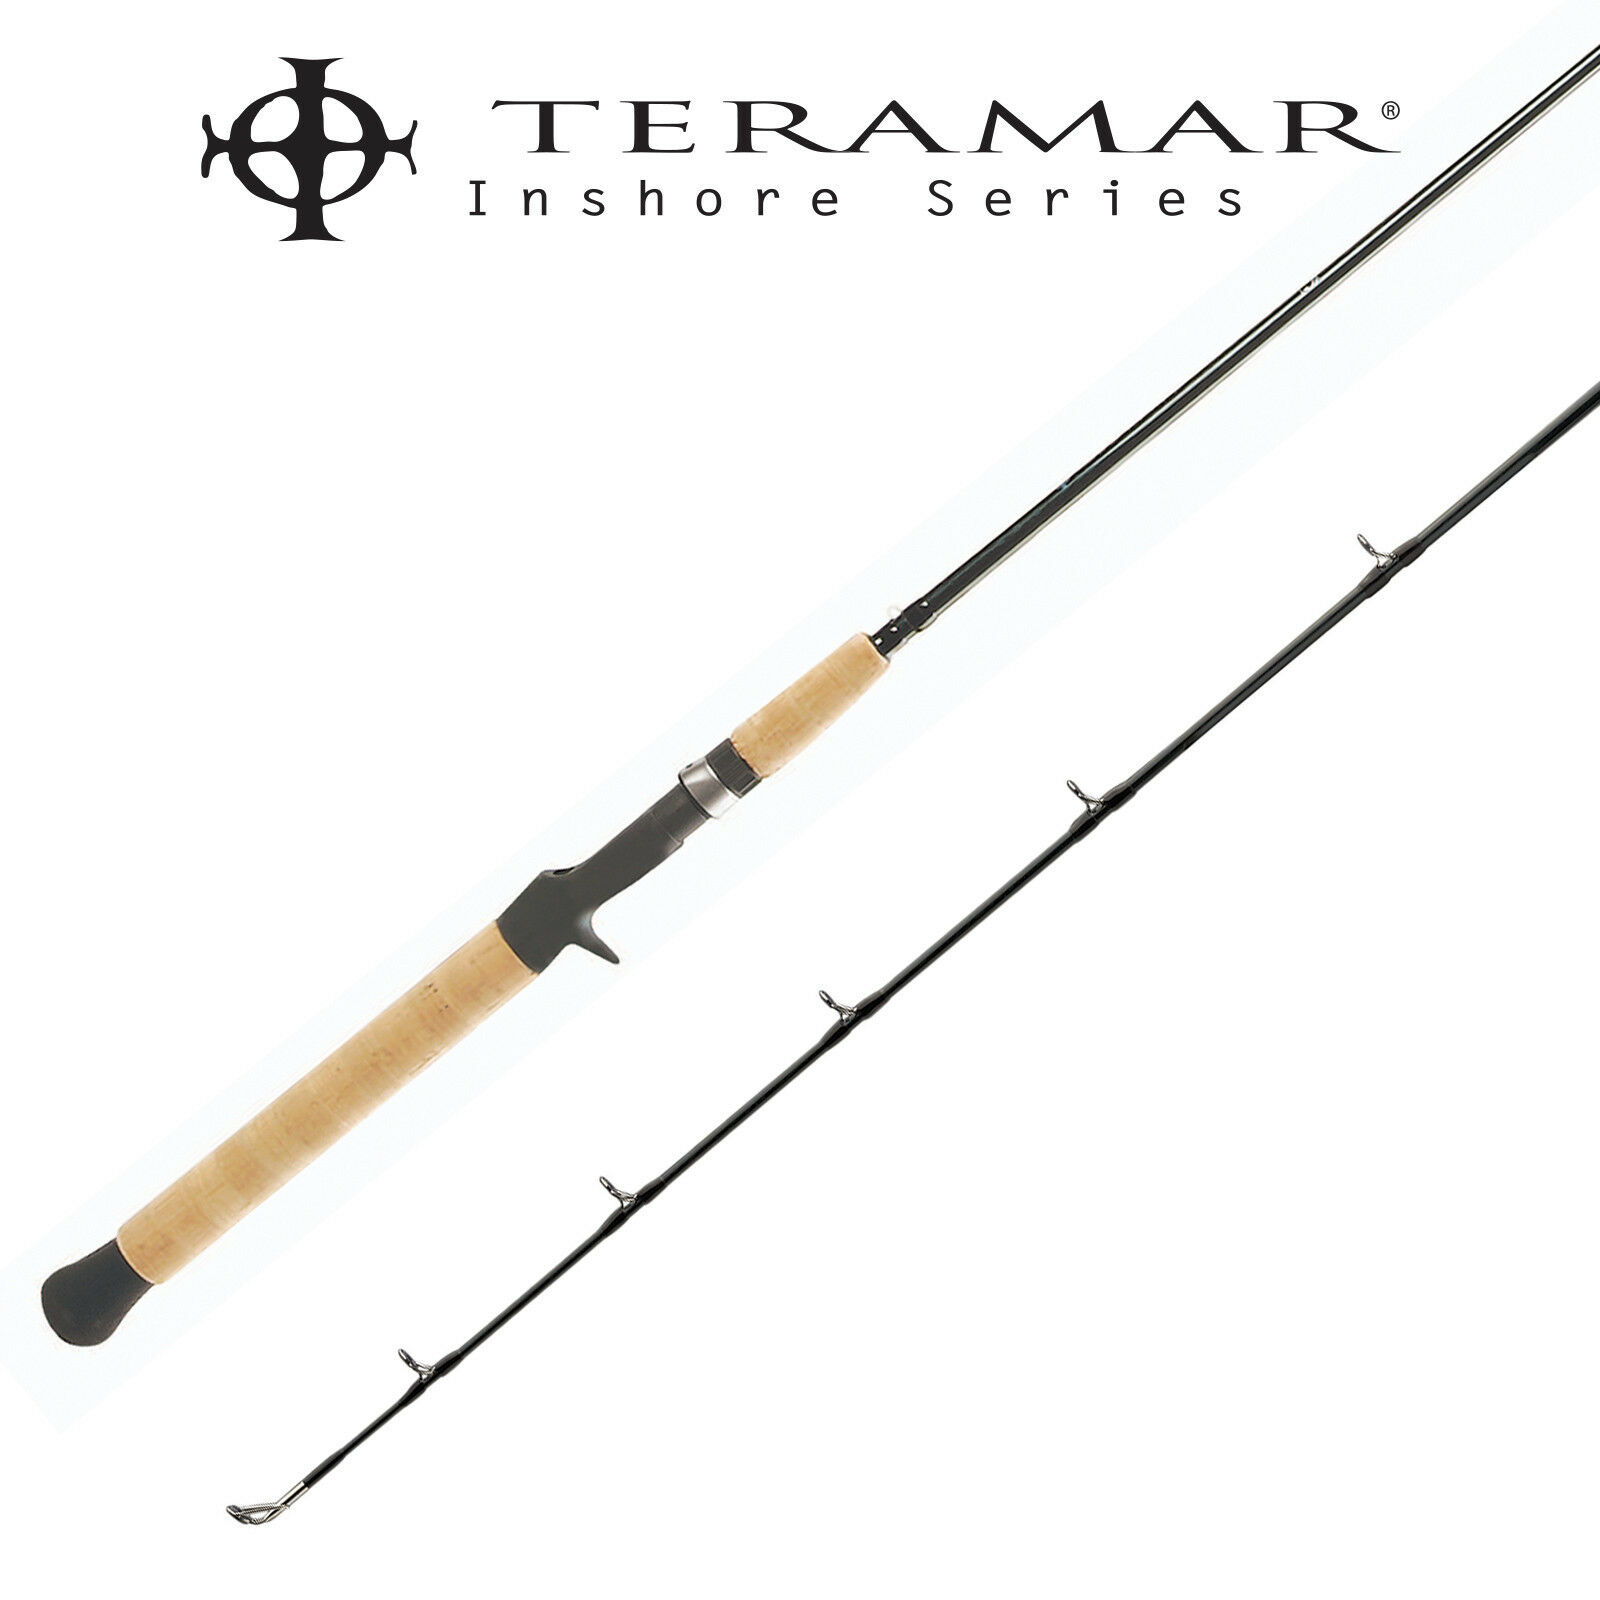 Shimano Teramar SE Inshore Casting Rod Rod Rod TMCX70H 7'0  Heavy 1pc 40a0b4